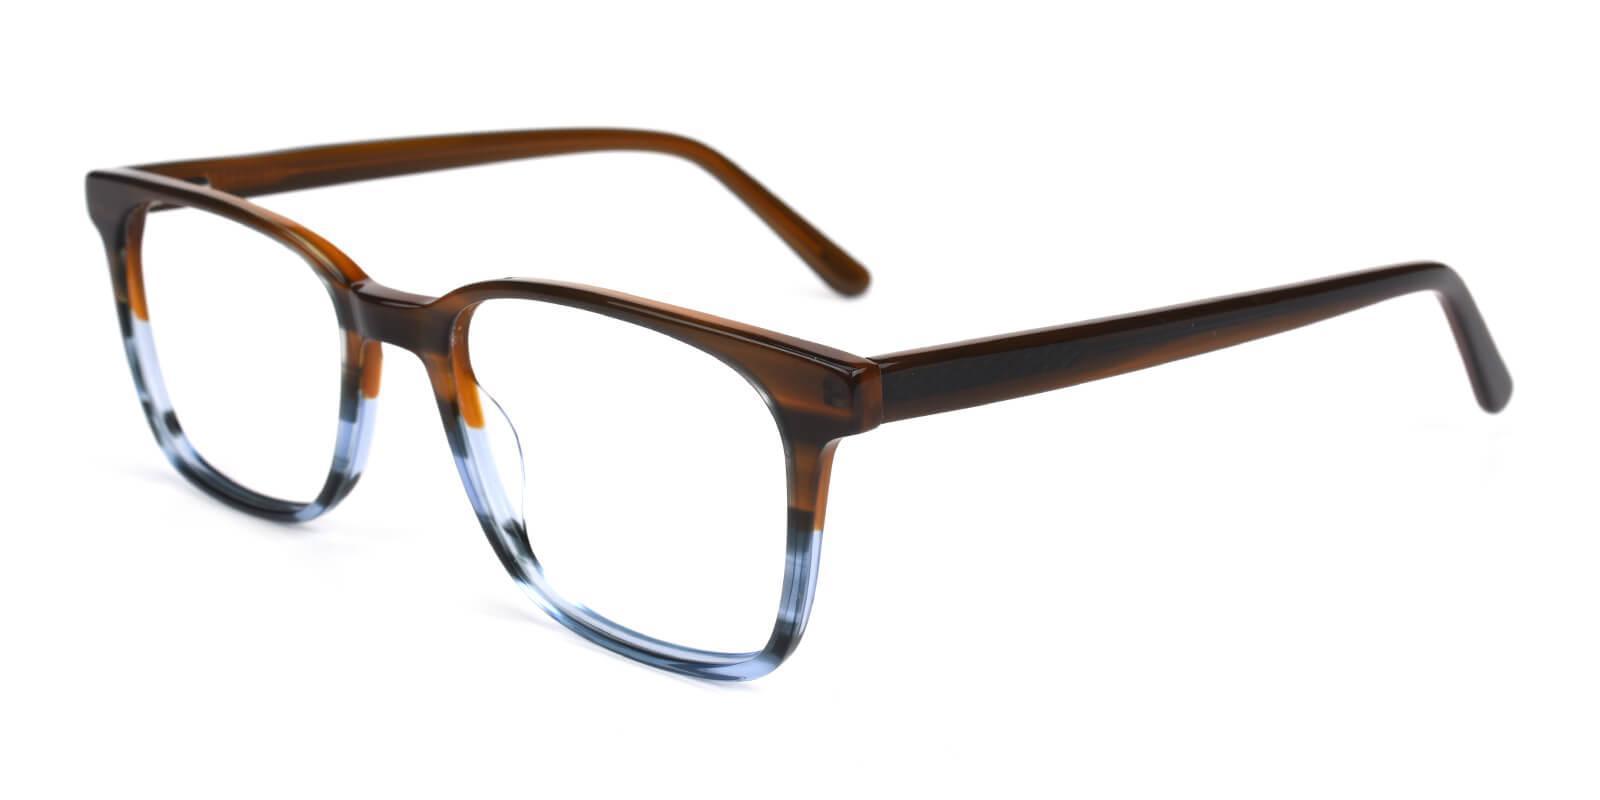 Reverb Brown Acetate Eyeglasses , SpringHinges , UniversalBridgeFit Frames from ABBE Glasses